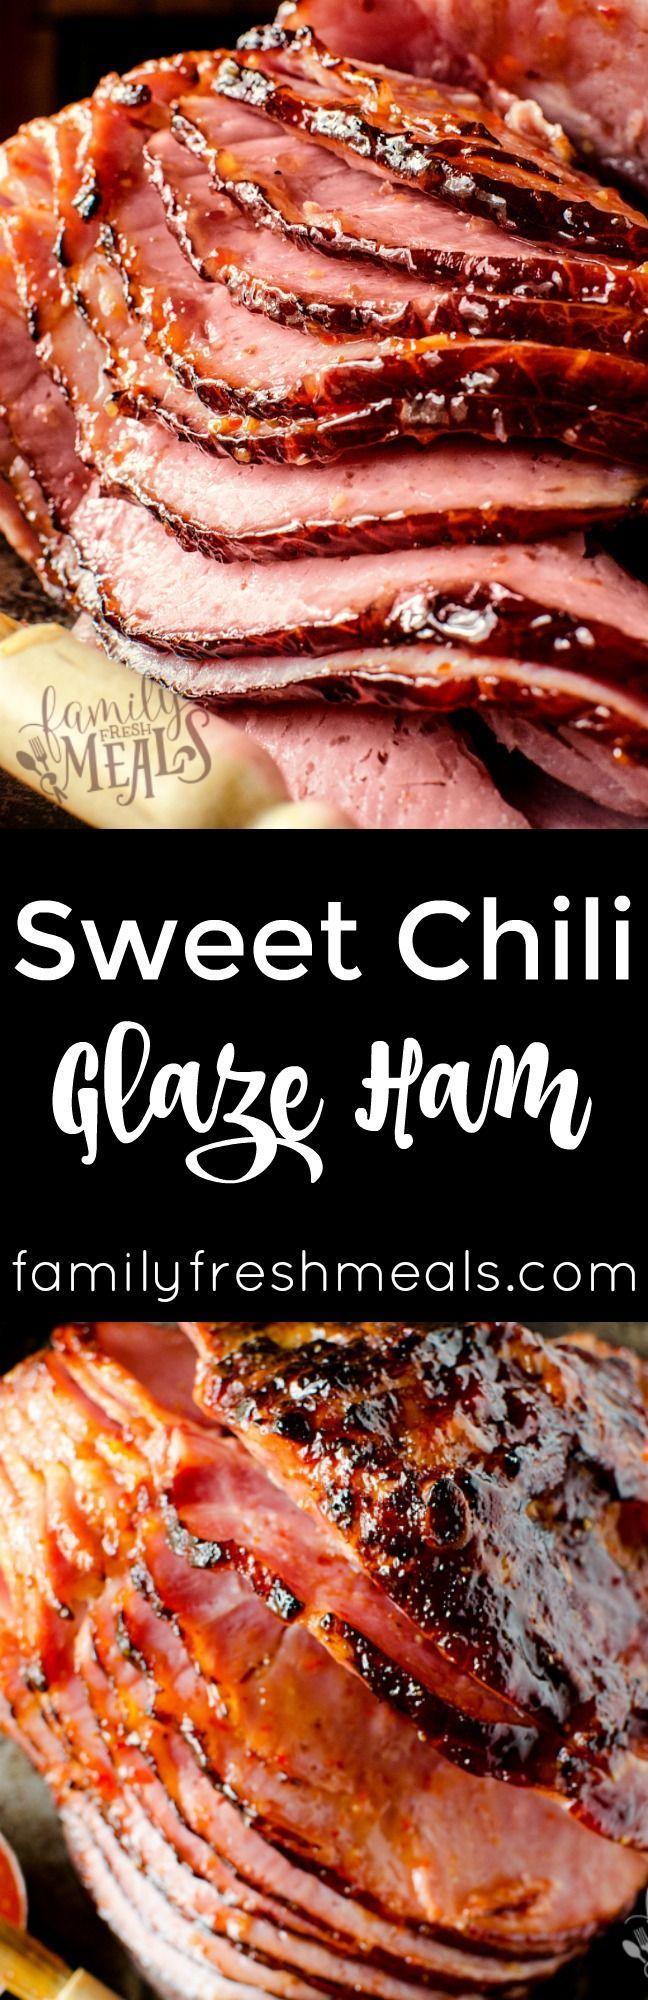 Sweet Chili Glaze Ham Recipe - Family Fresh Meals